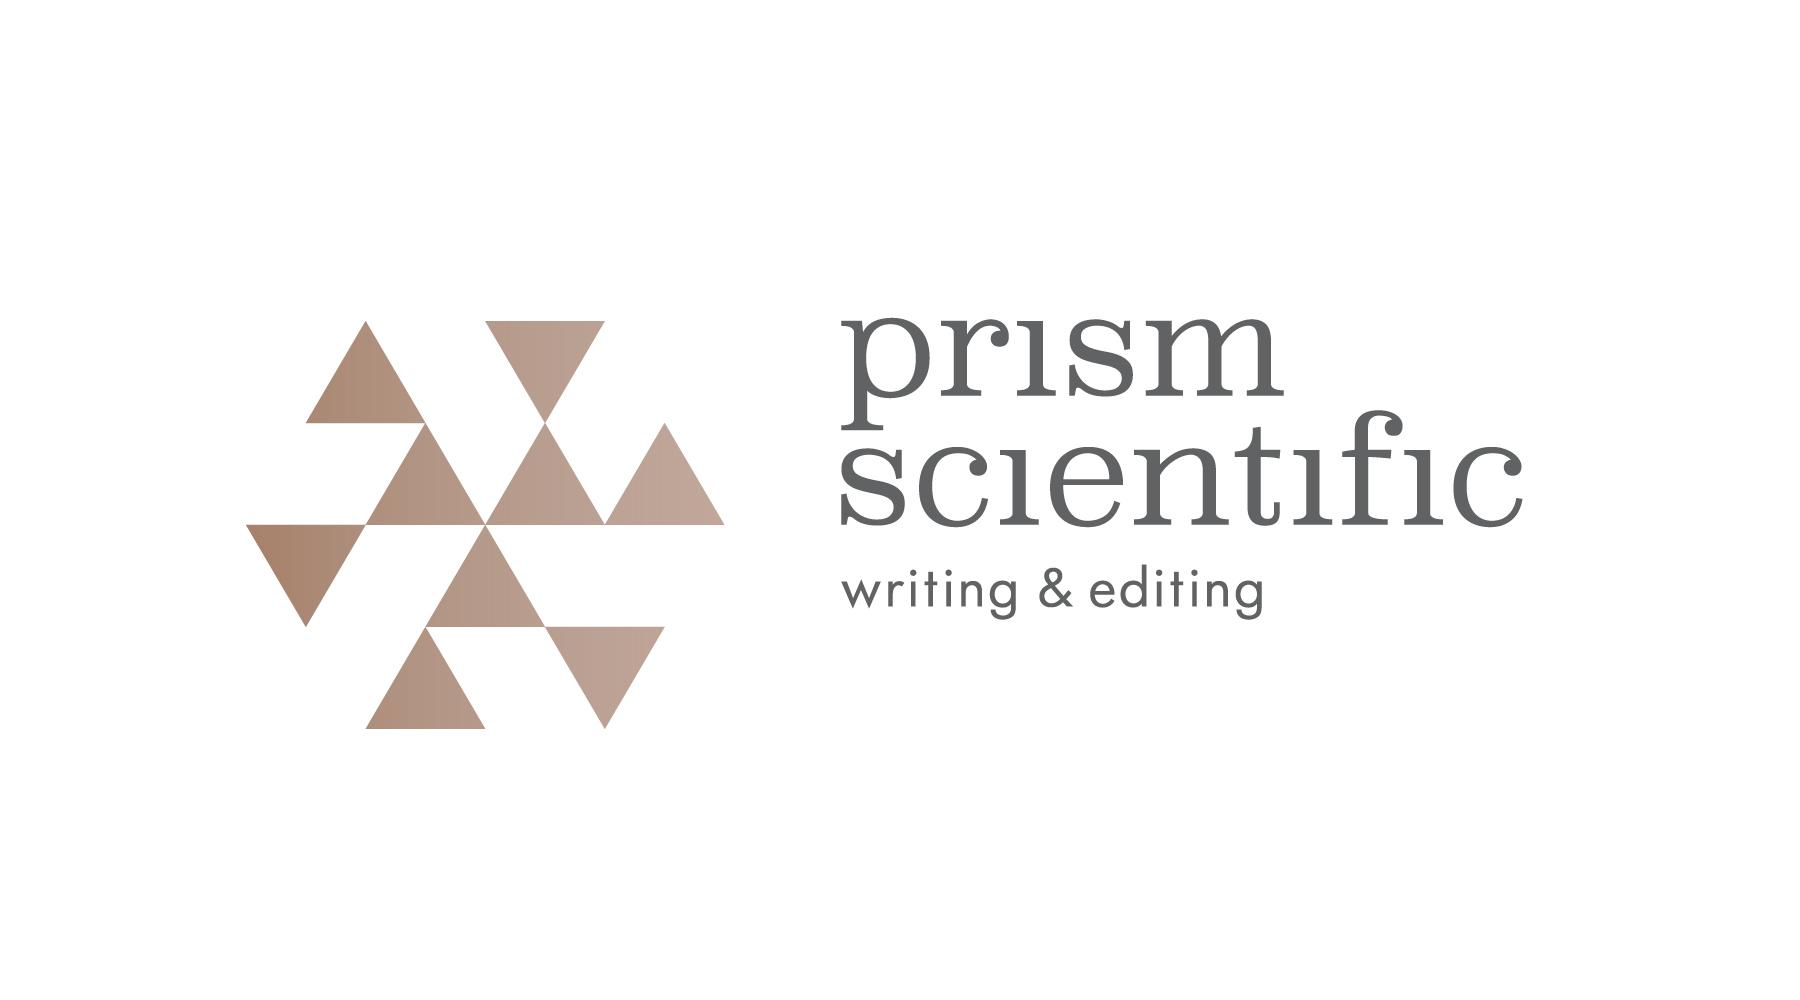 prismscientific logo design identité